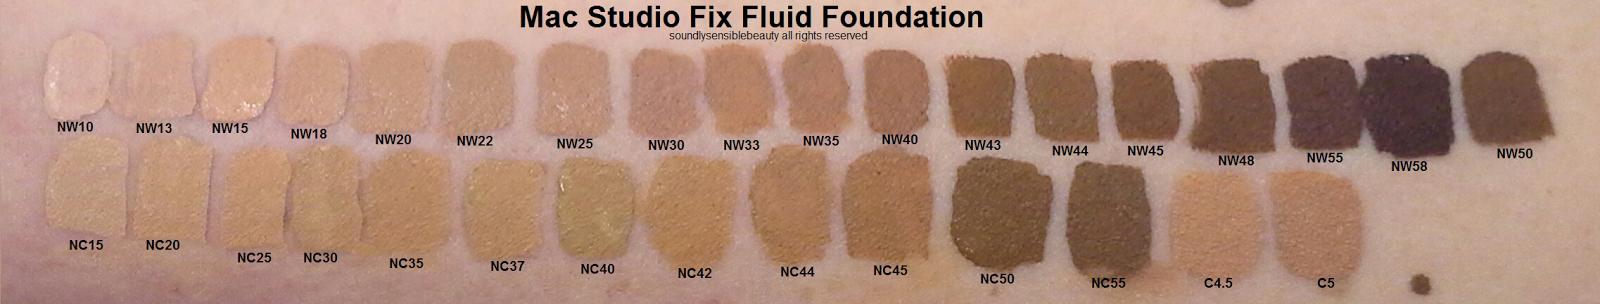 Studio Fix Fluid Foundation by MAC #5